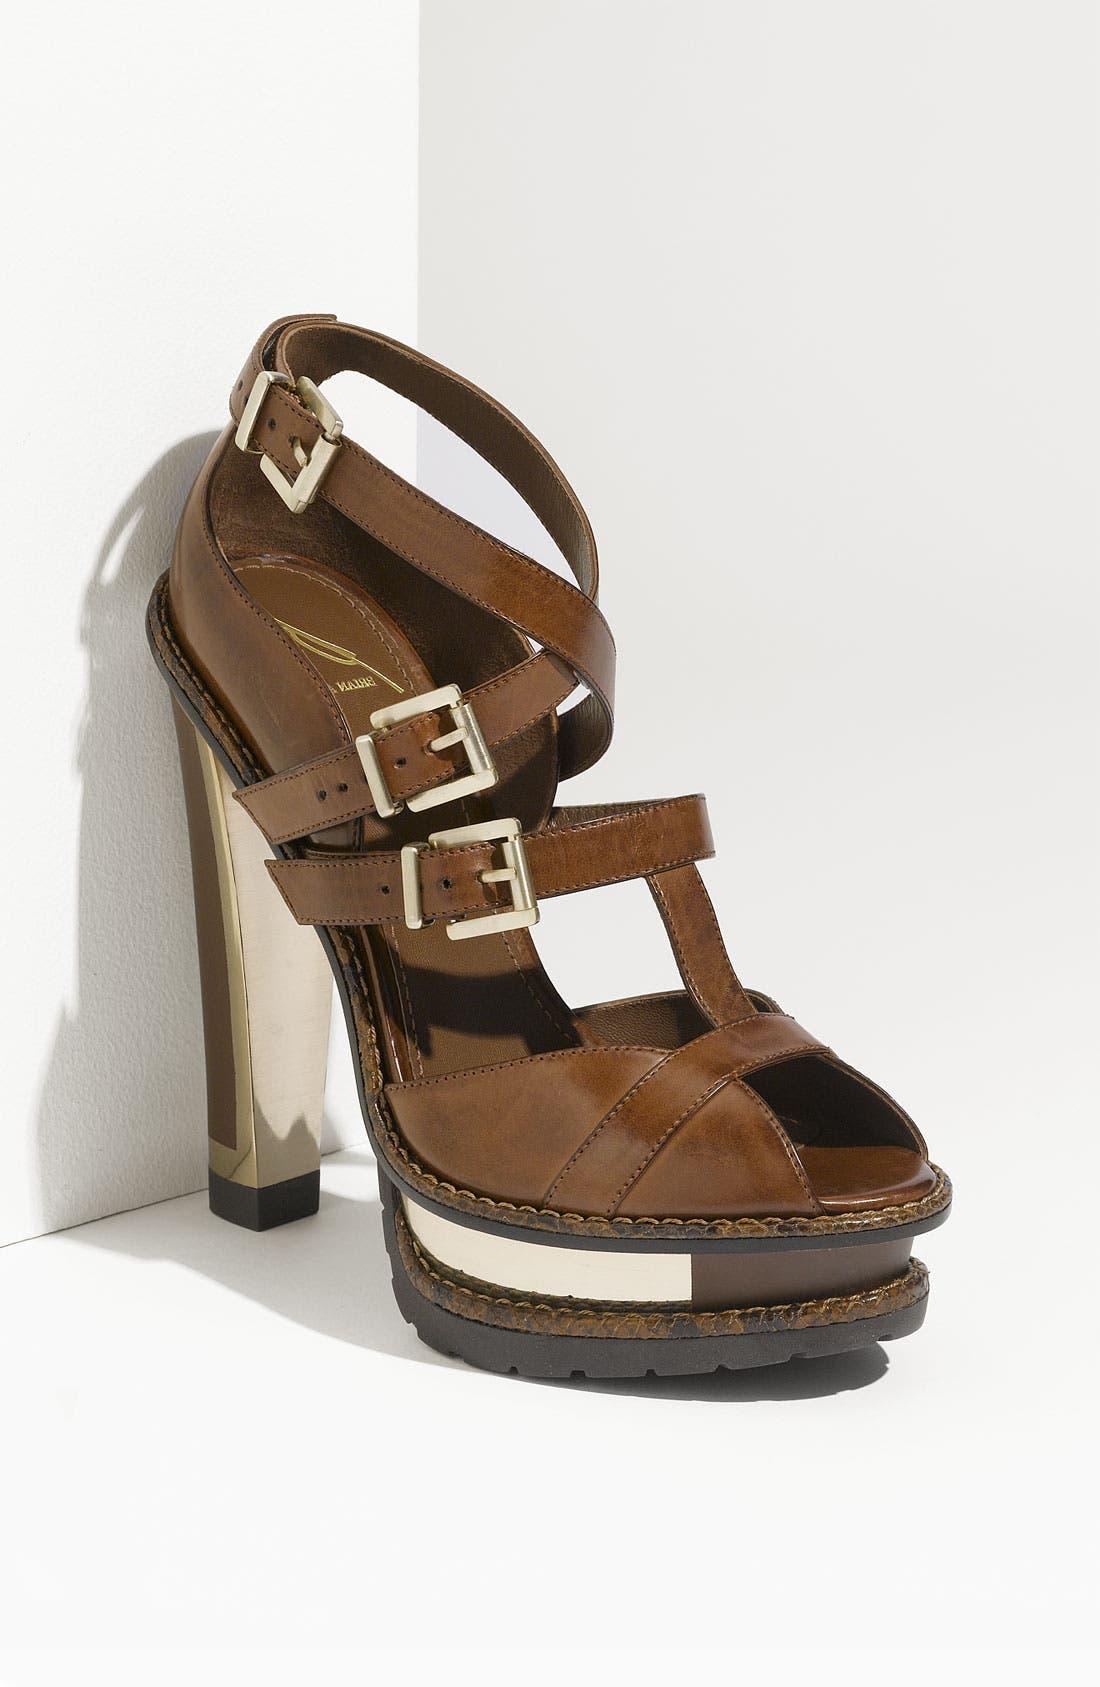 Alternate Image 1 Selected - B Brian Atwood 'Teatro' High Heel Sandal